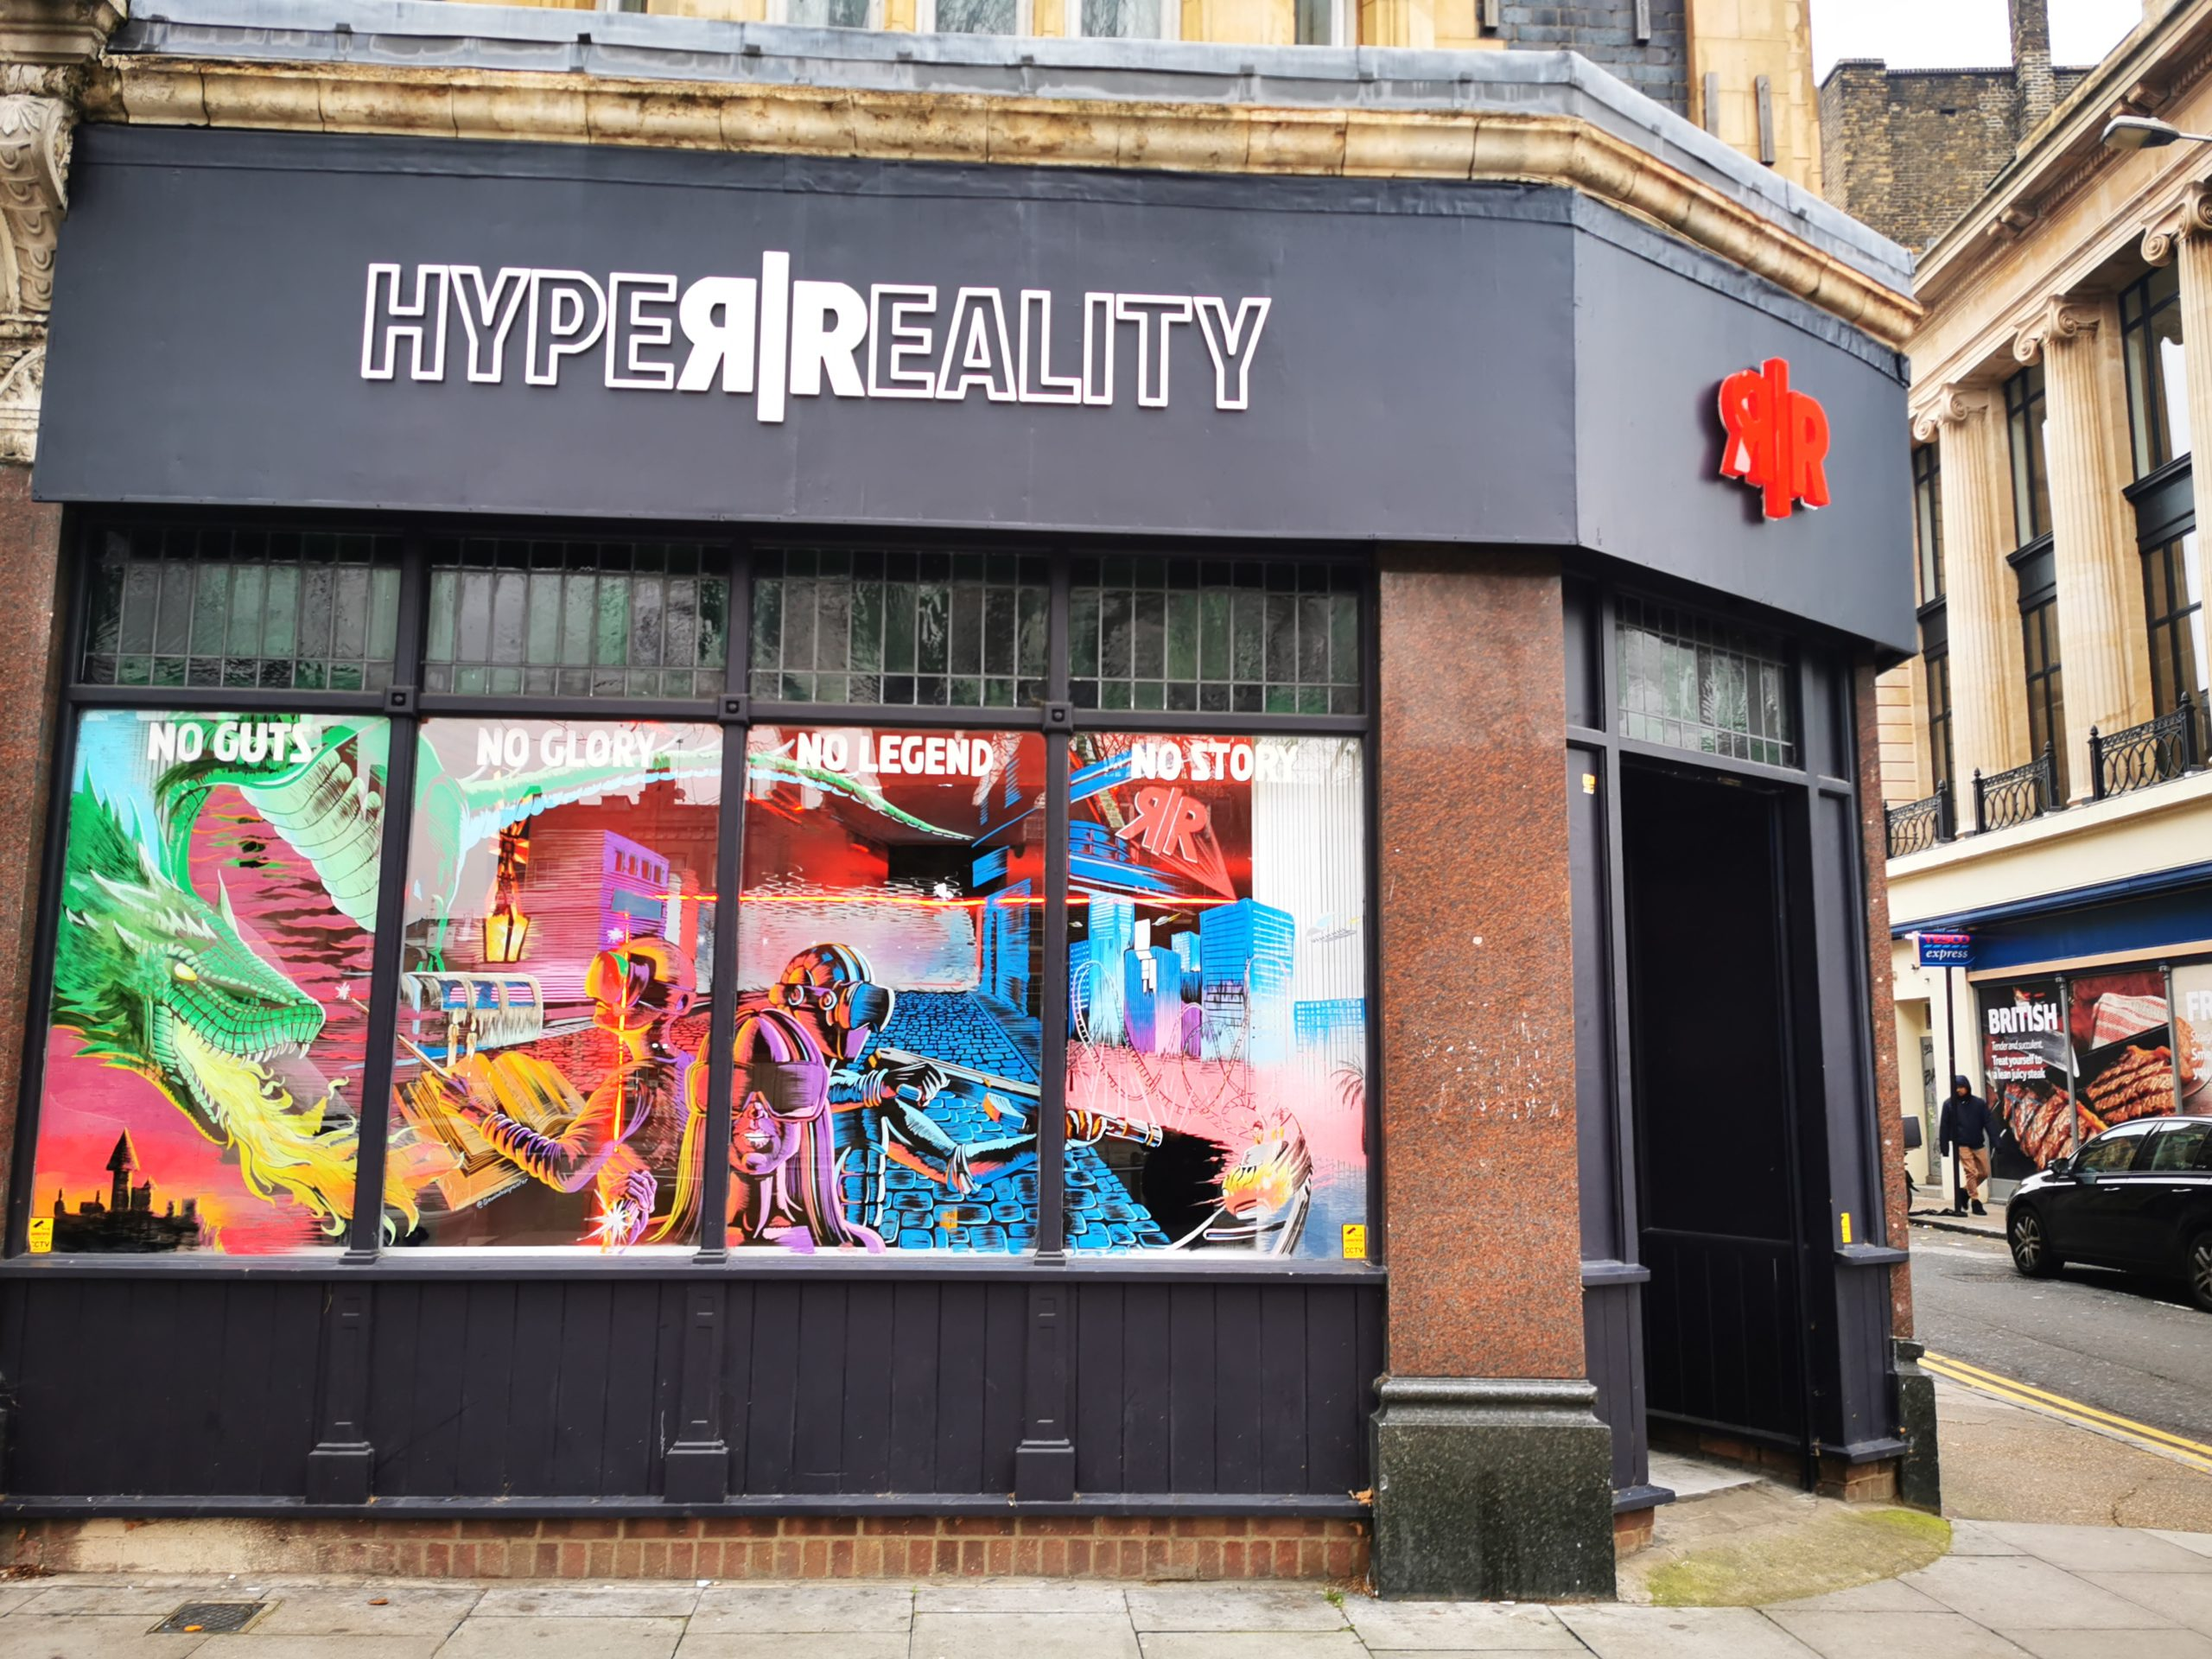 Hyper Reality